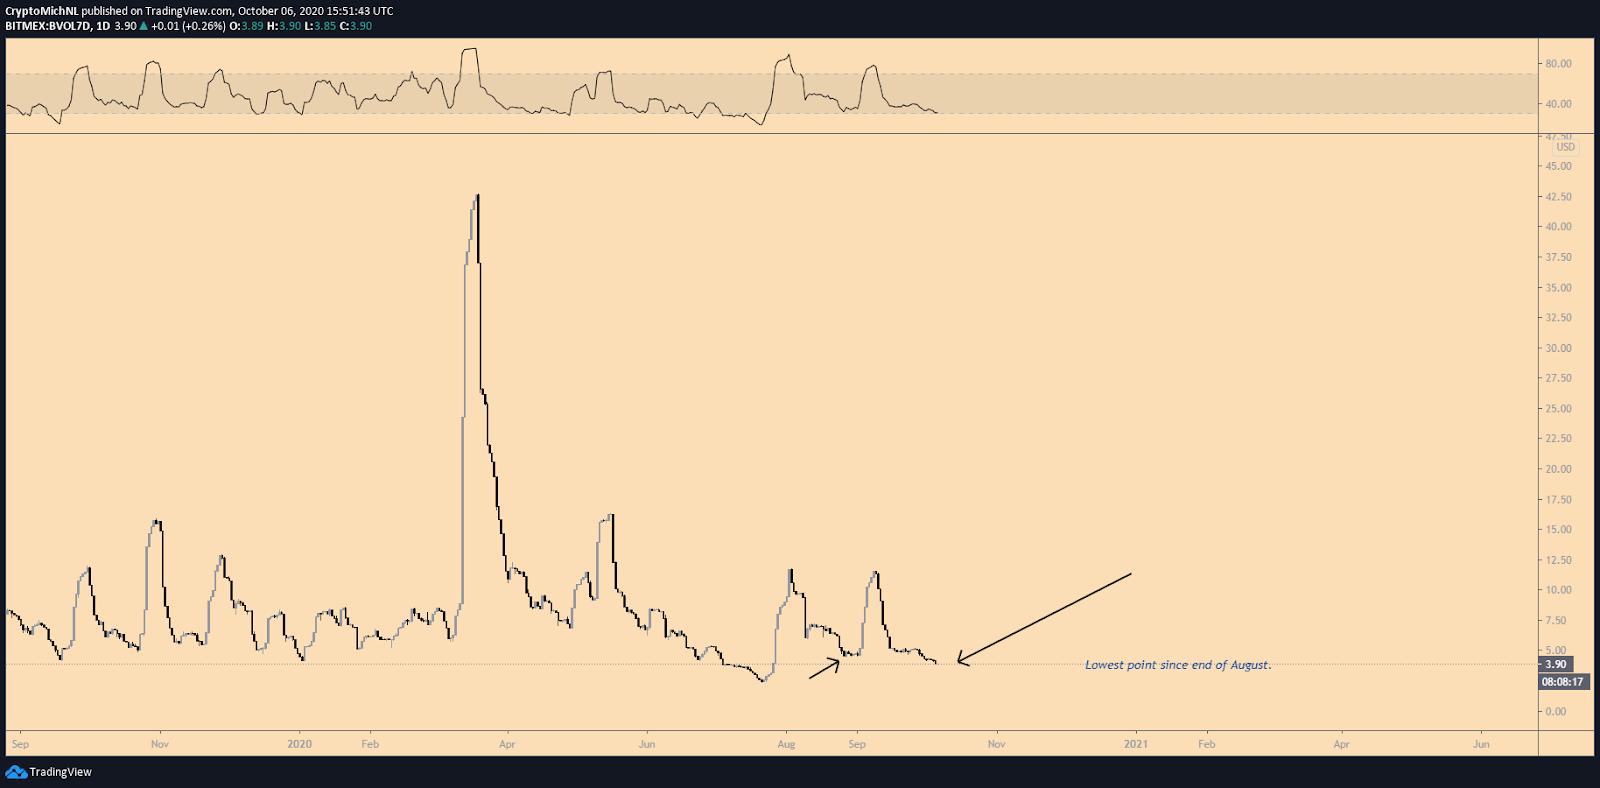 Índice de volatilidad de 7 días de Bitcoin